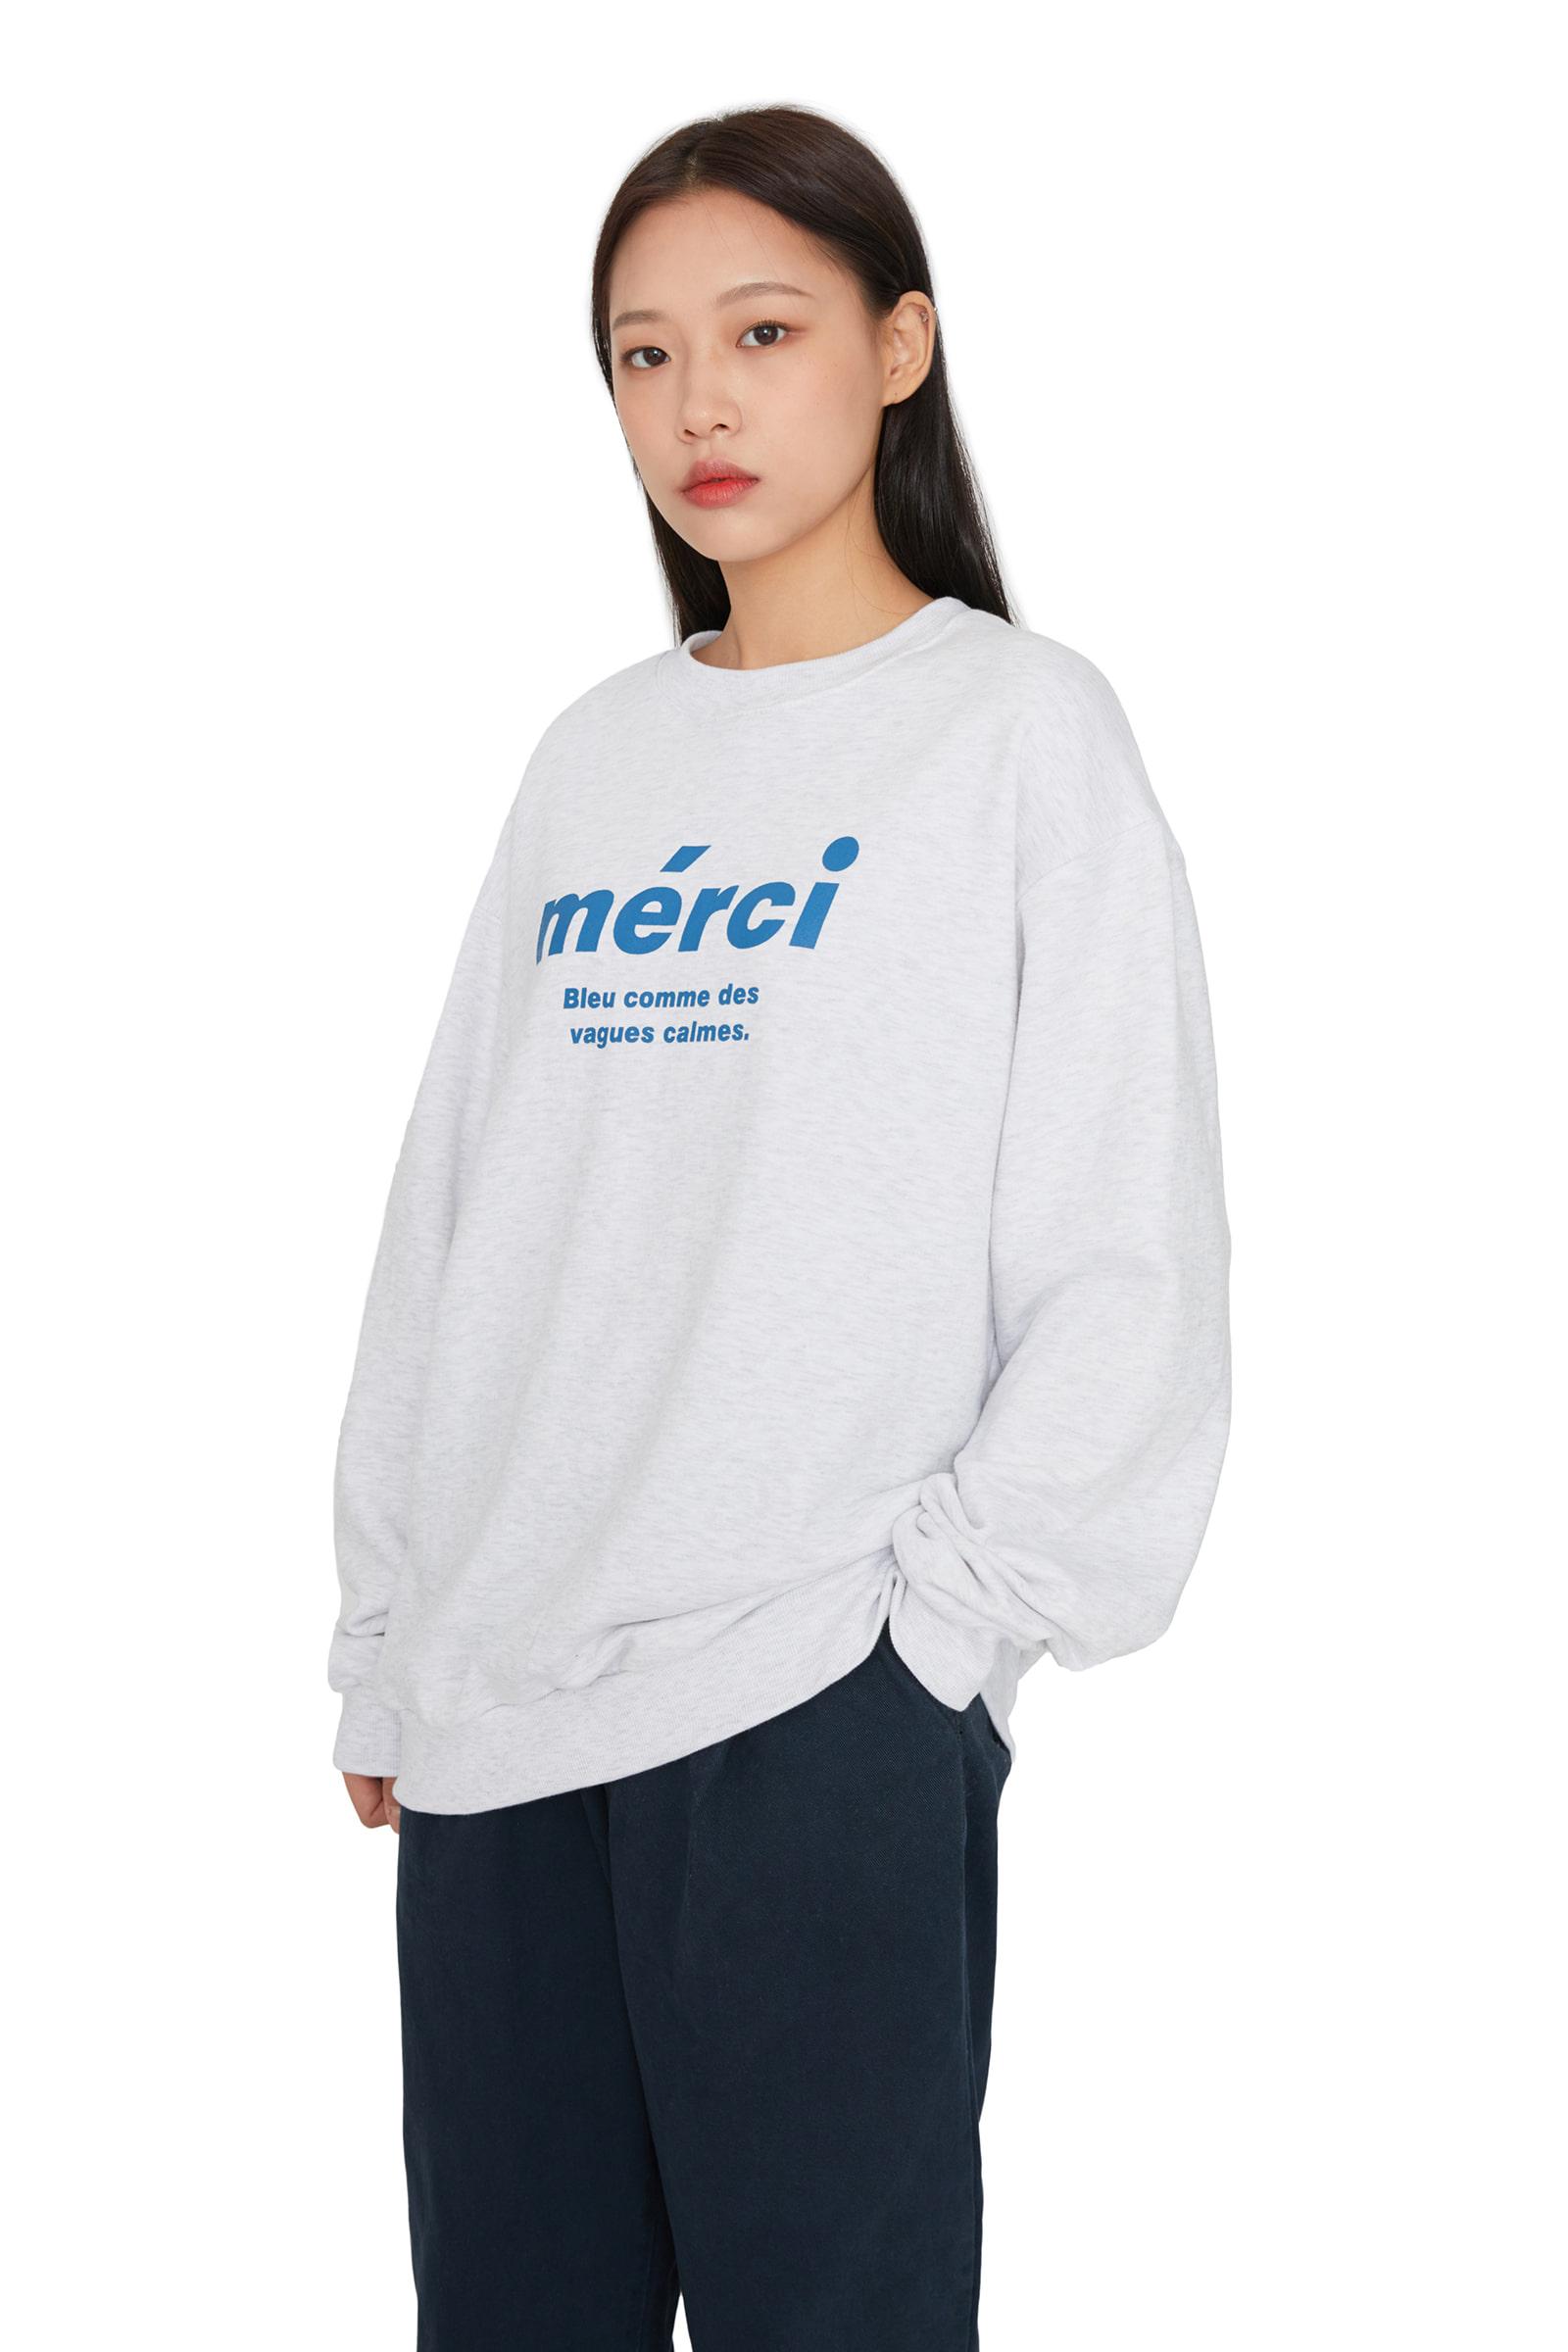 Mercy printed sweatshirt